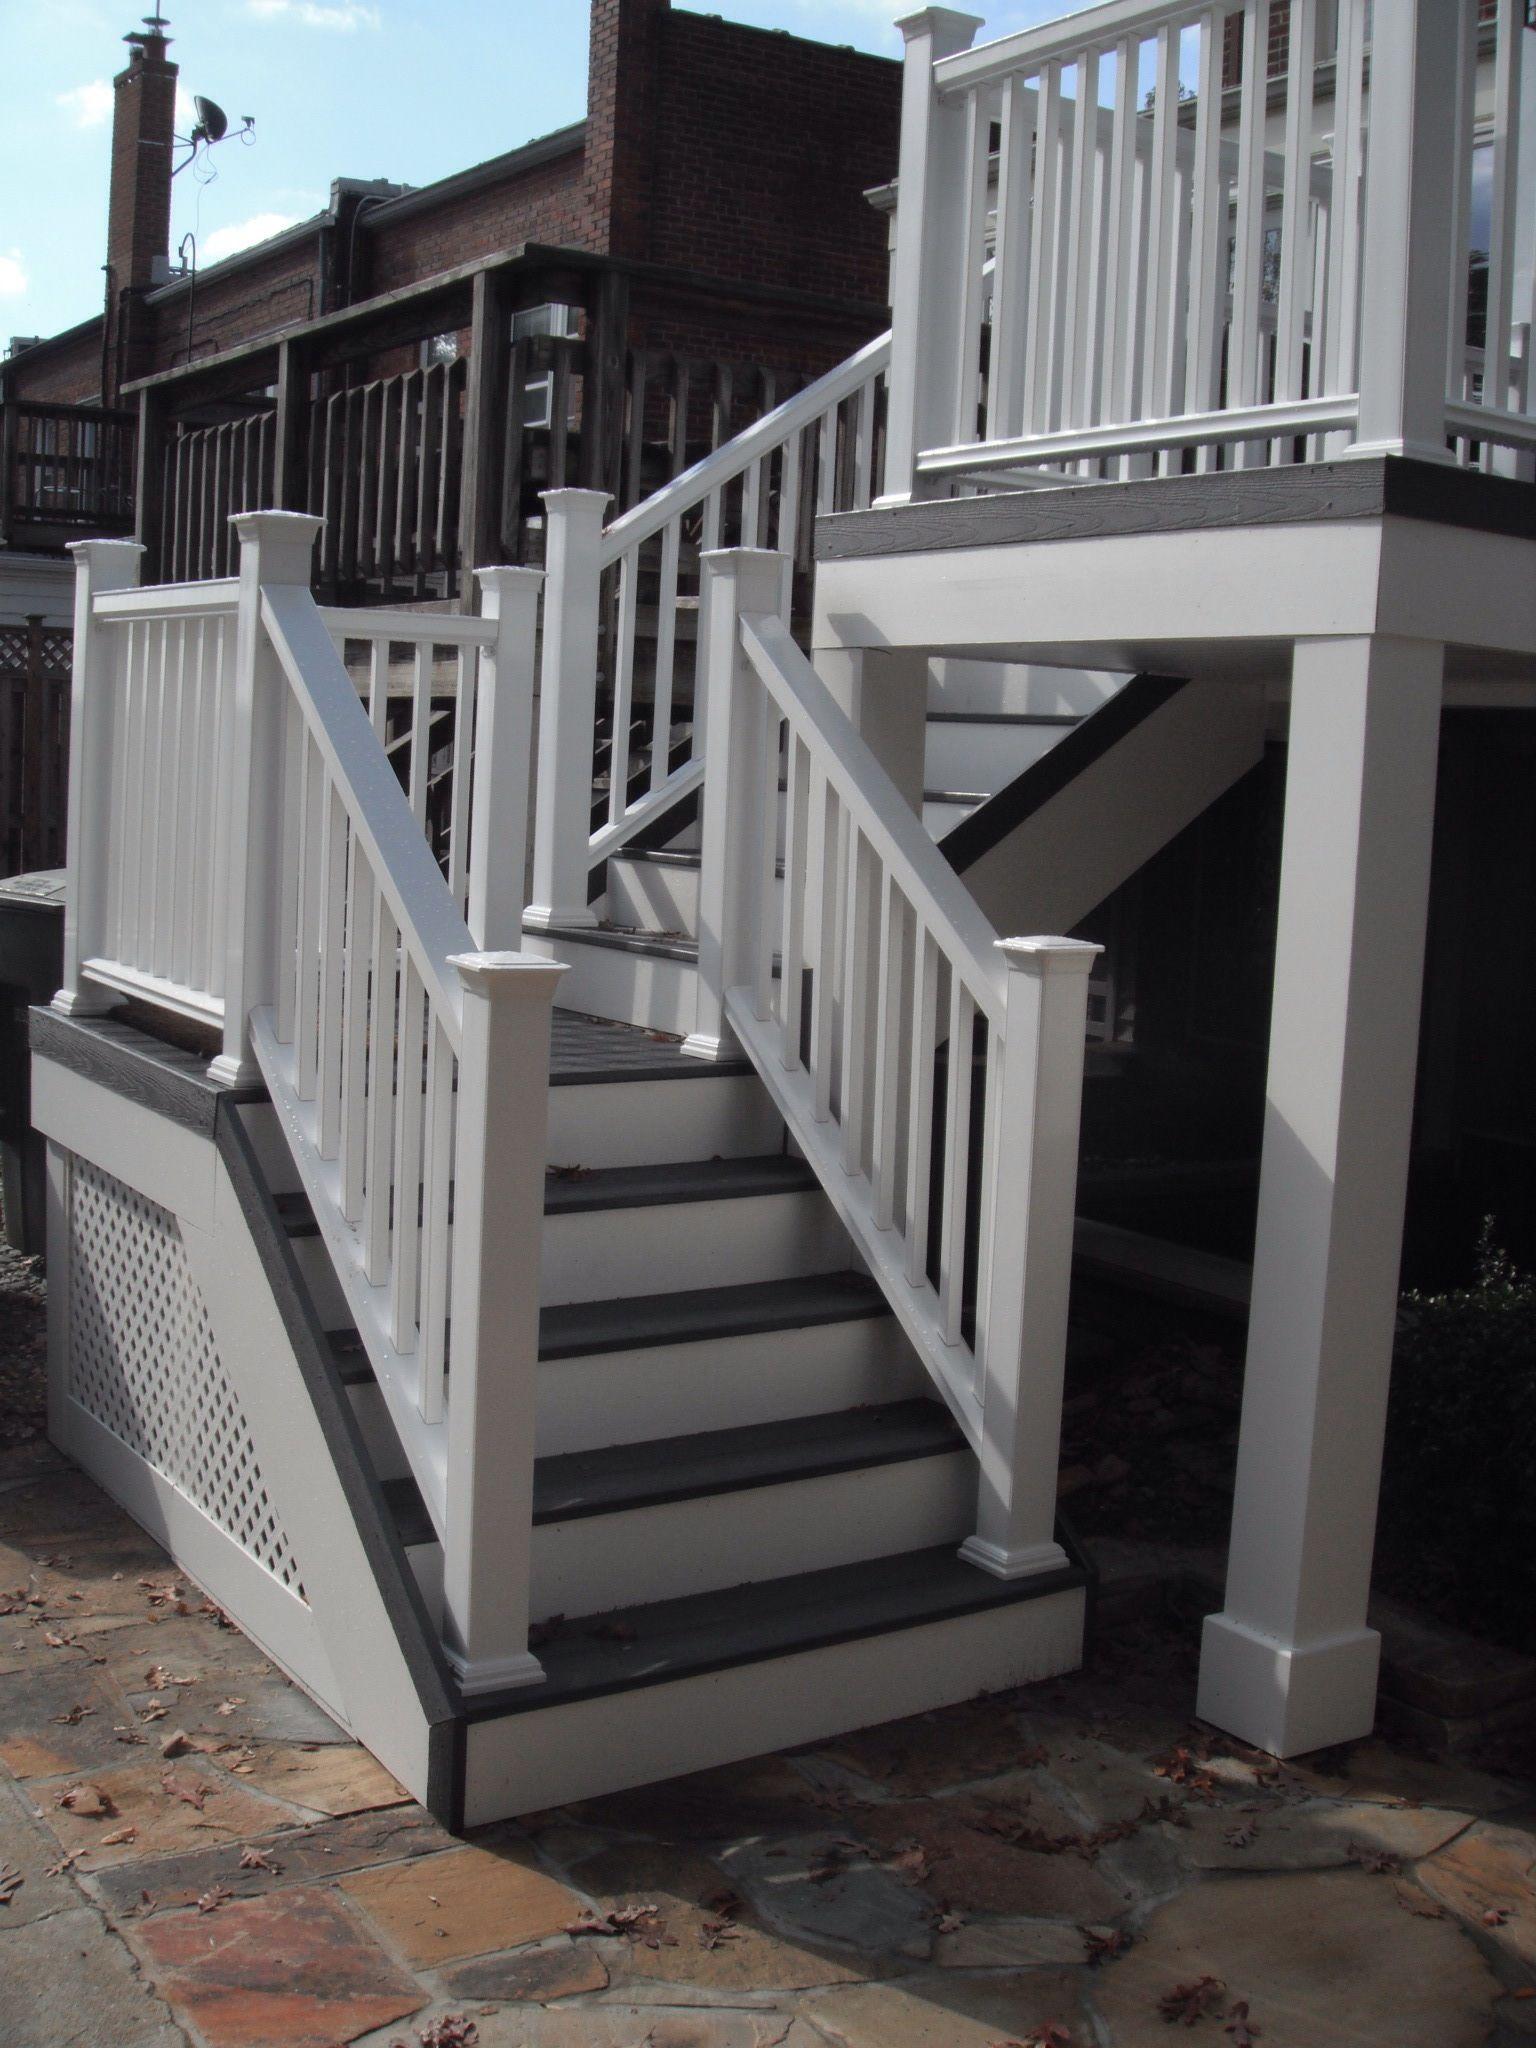 Best Front Porch Colors Tiffany Cade Slankard Front Porch 400 x 300